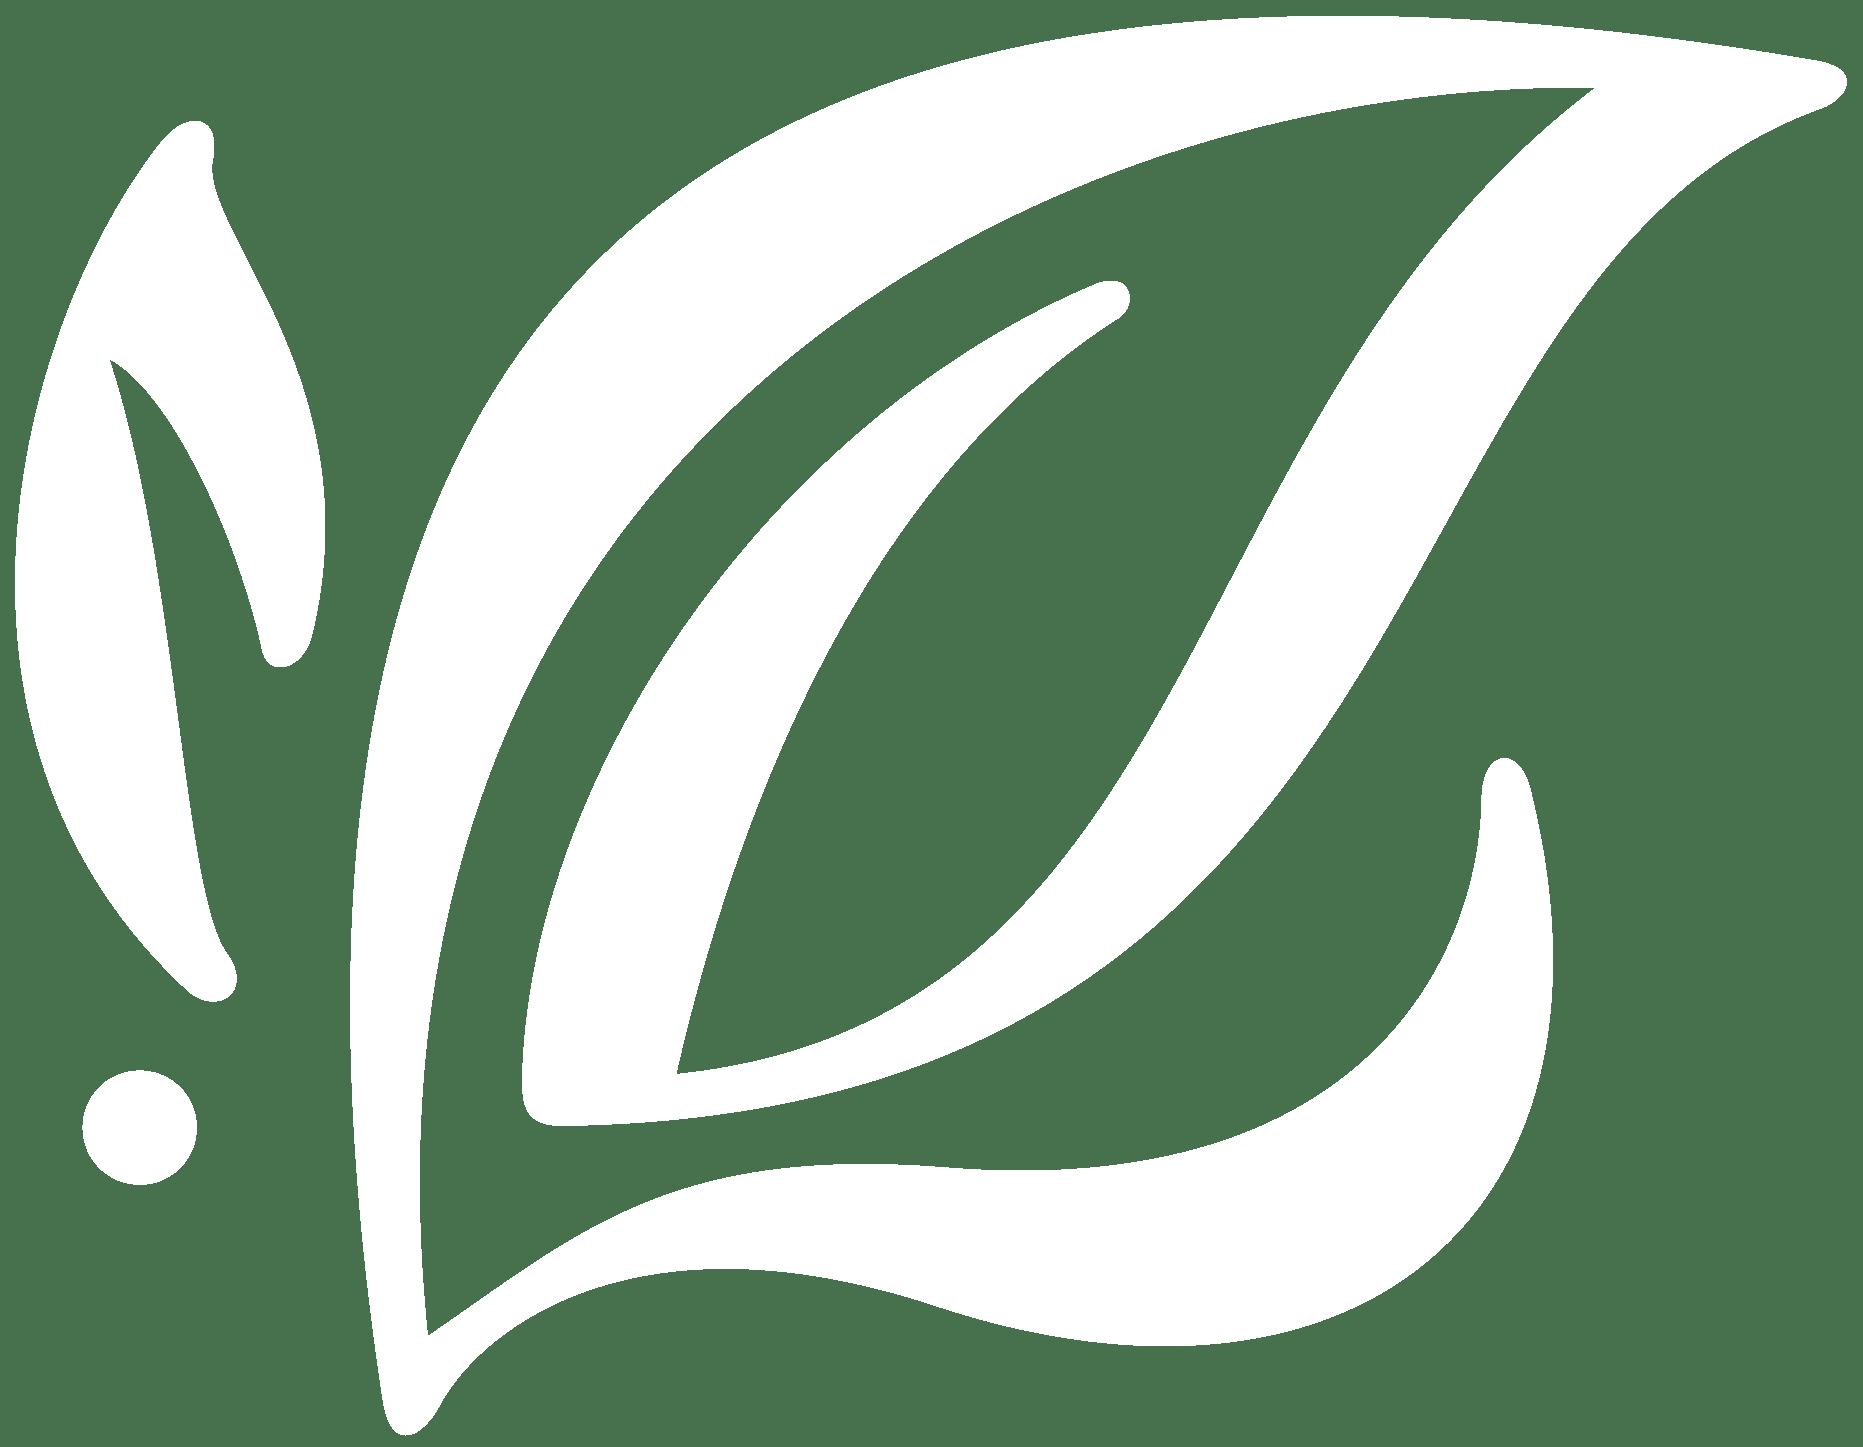 Brand mark at Pacifica Senior Living Menifee in Sun City, California